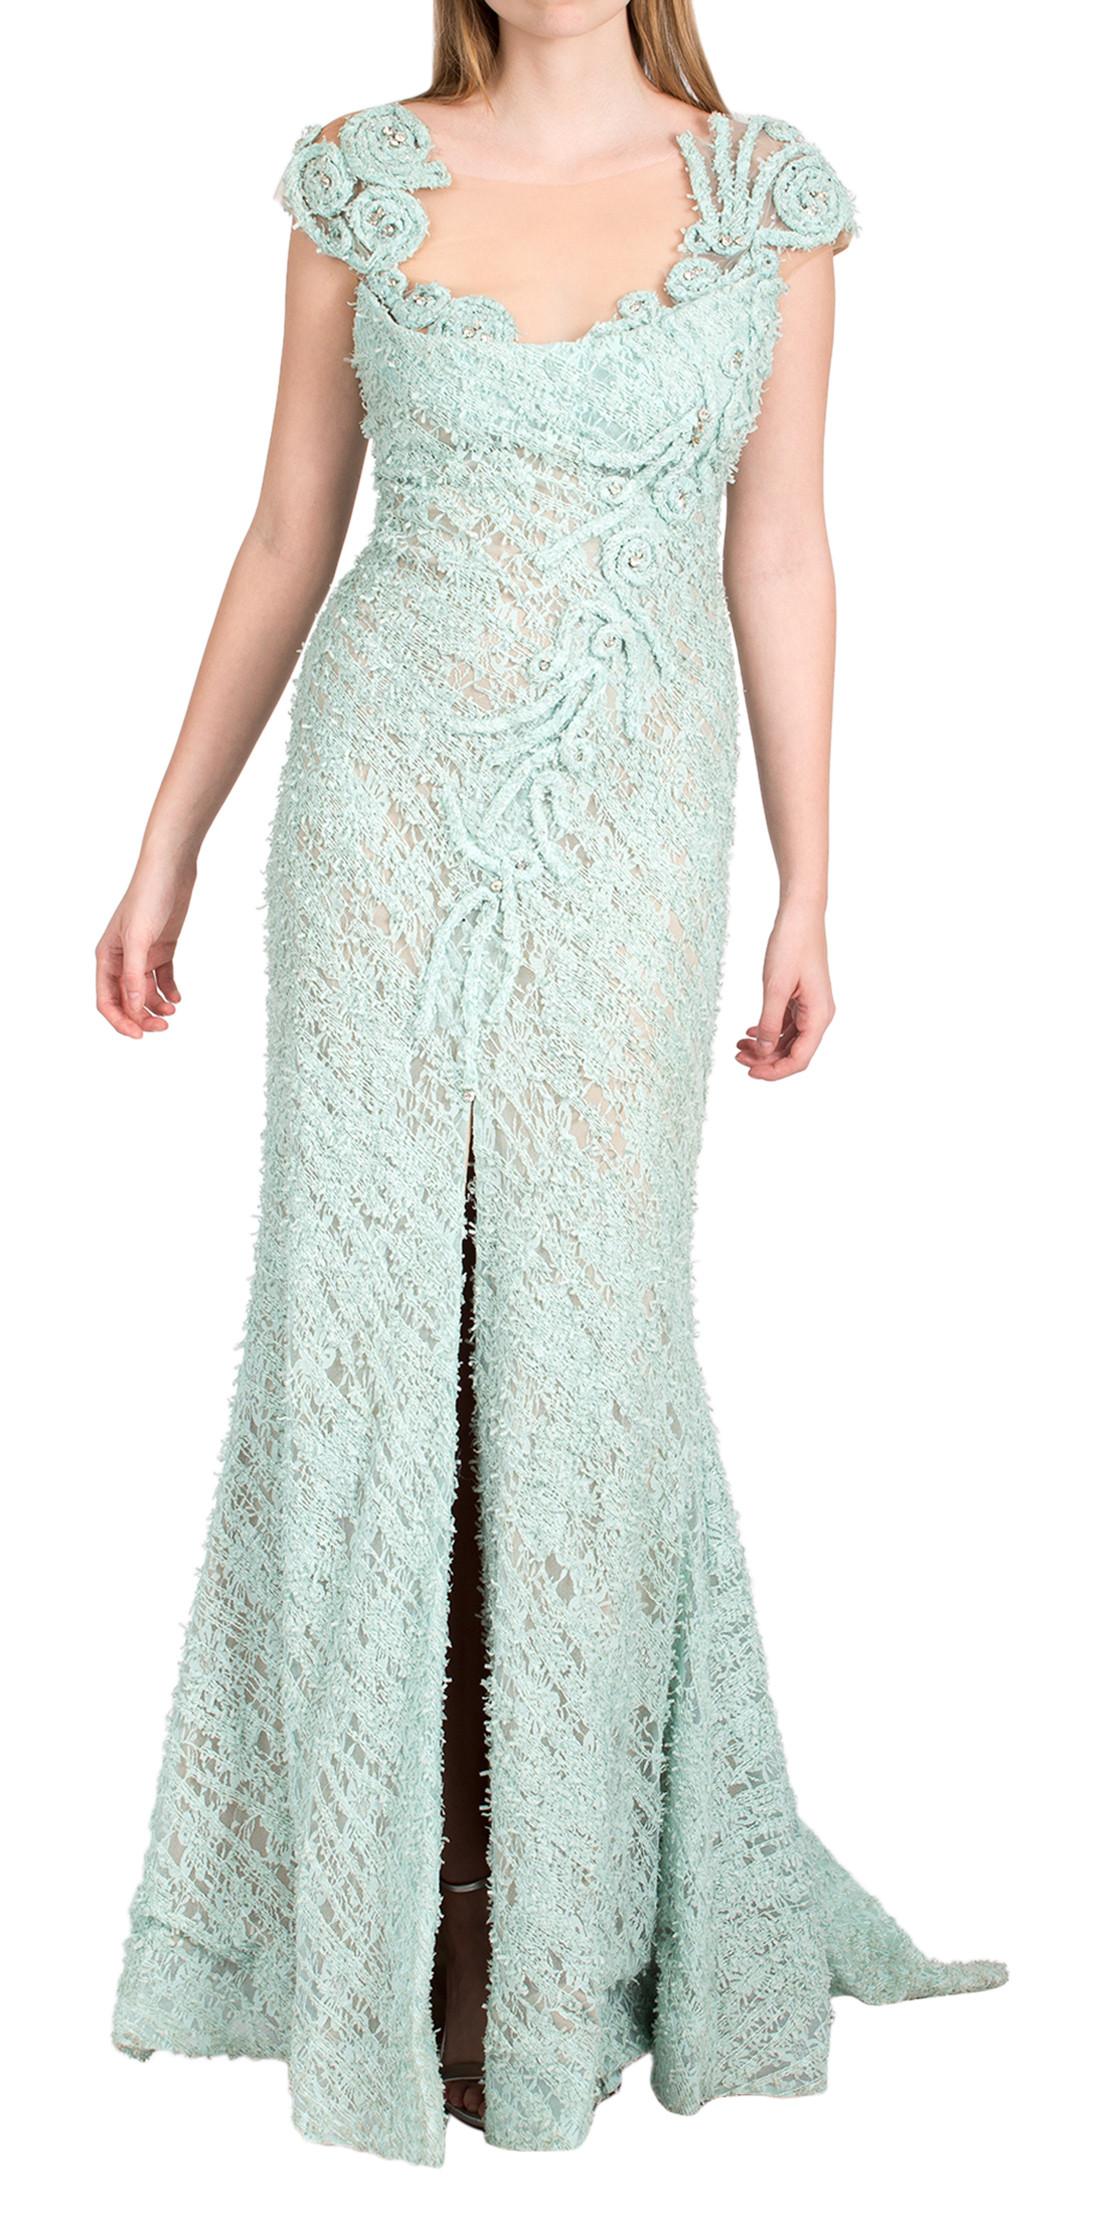 MNM Couture Sleeveless Maxi Dress